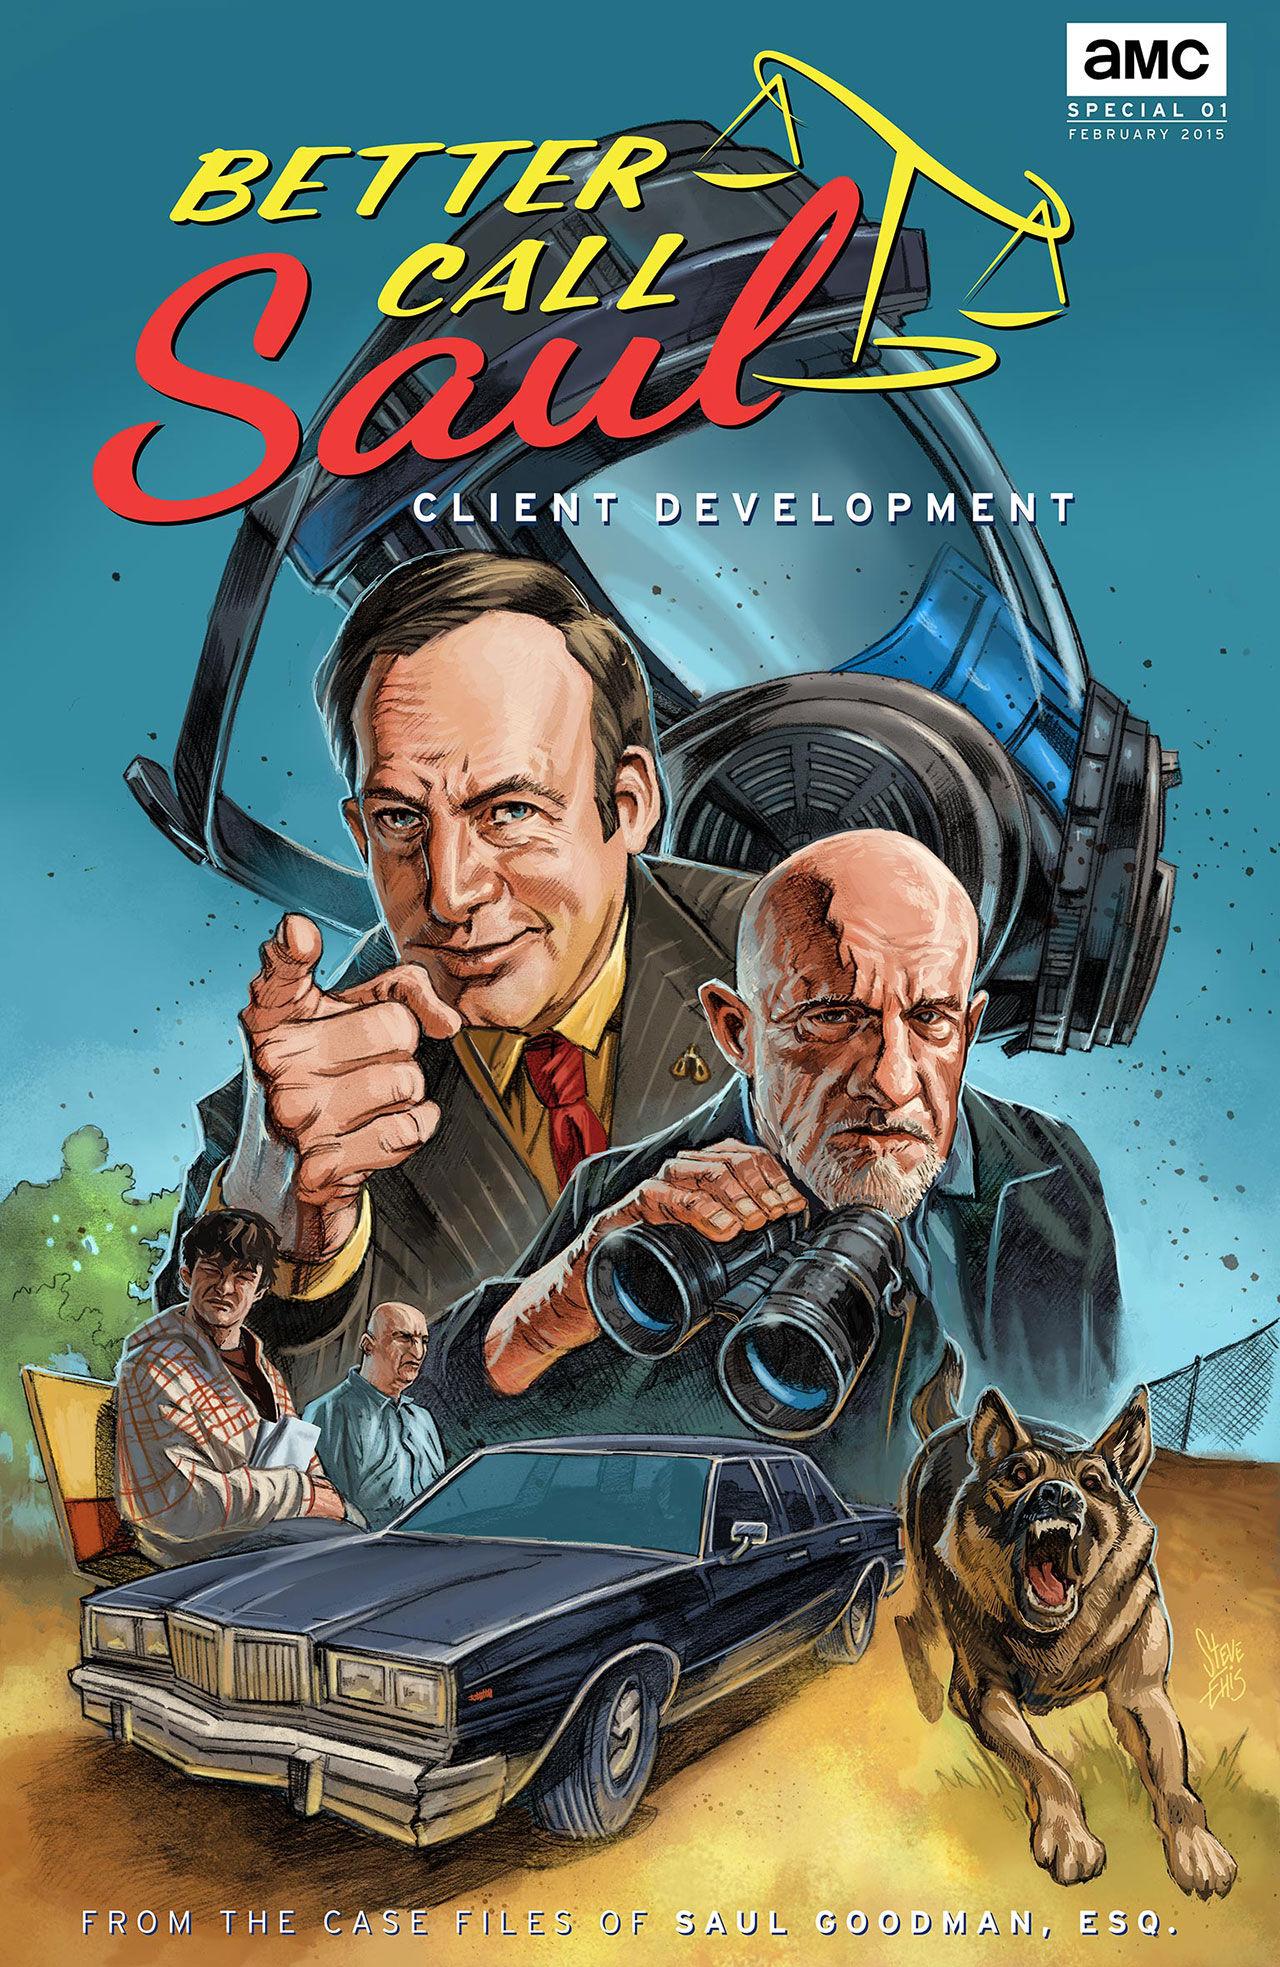 Better call Saul i serietidningsform